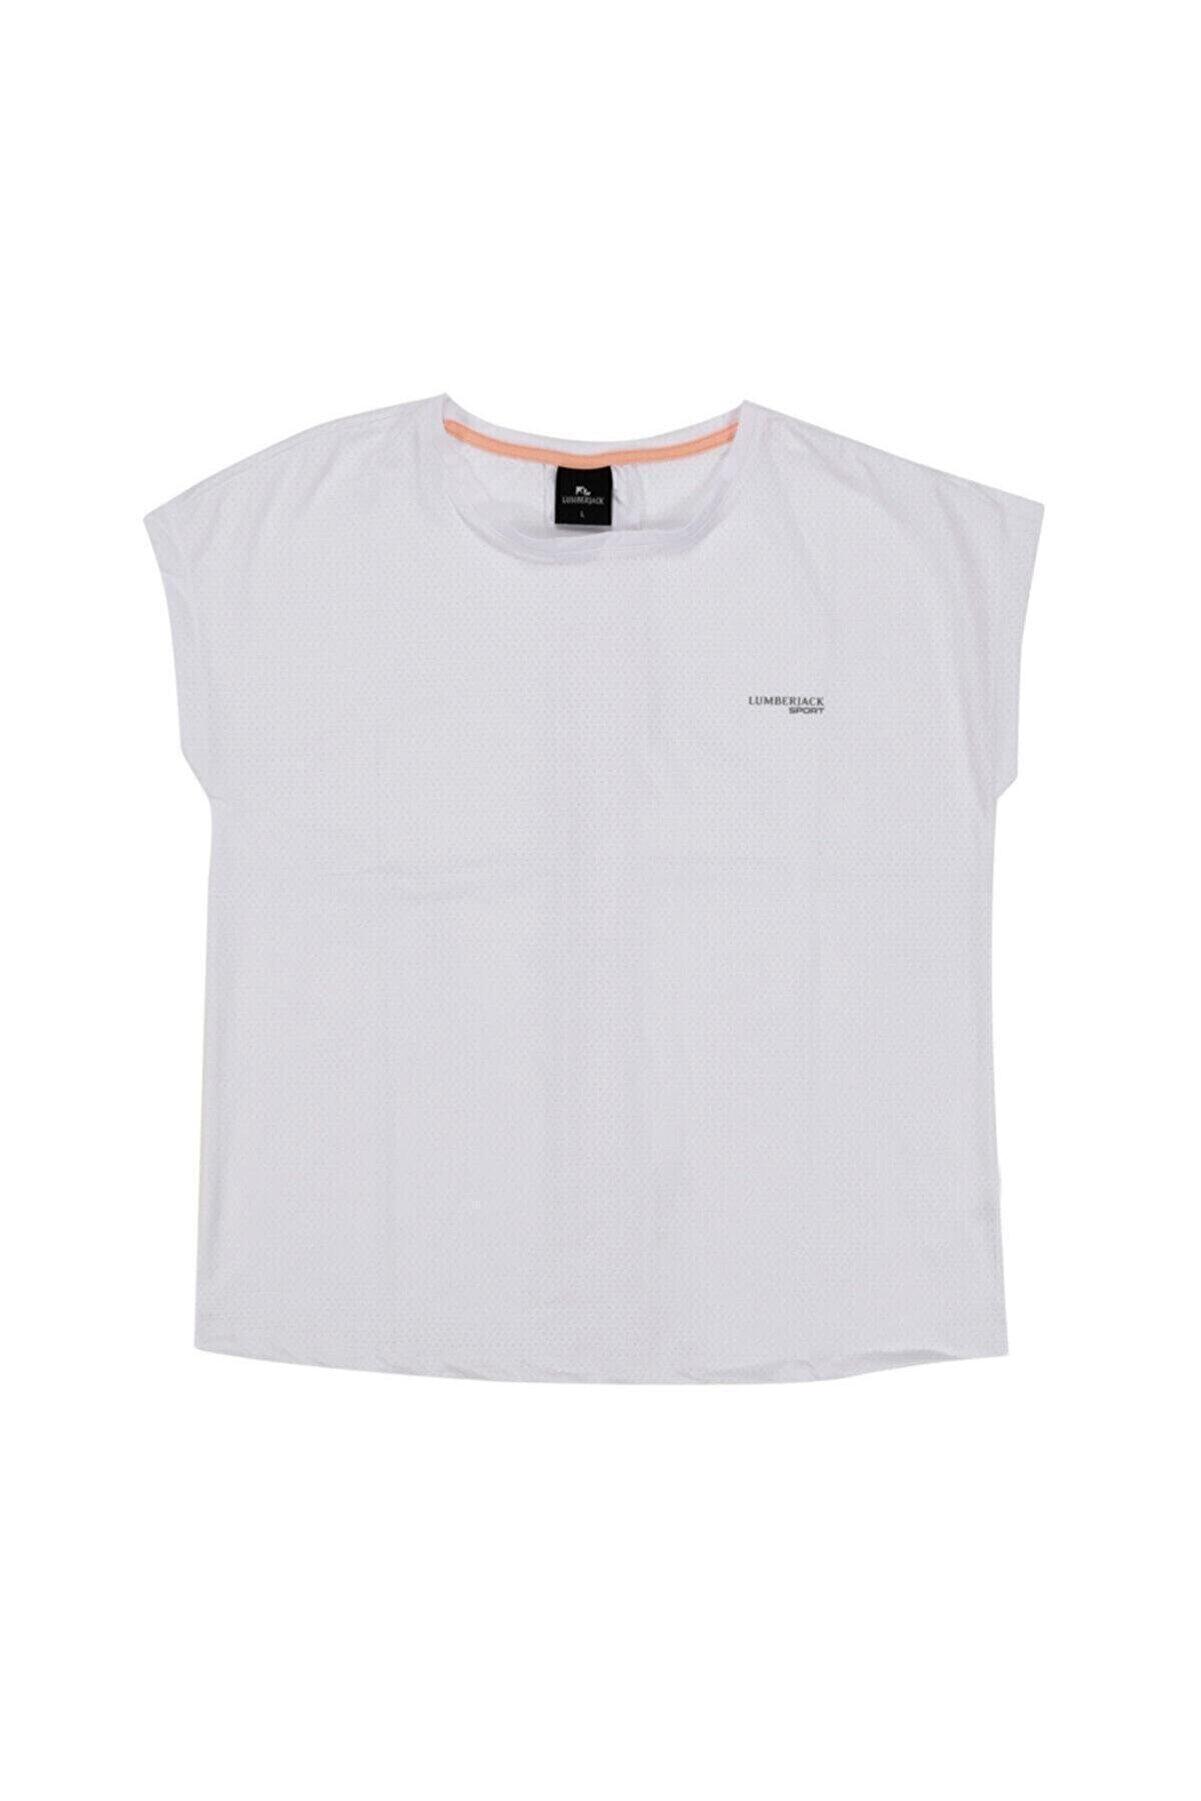 Lumberjack W-1827 TYBALT KK TSHIRT Beyaz Kadın T-Shirt 100512769